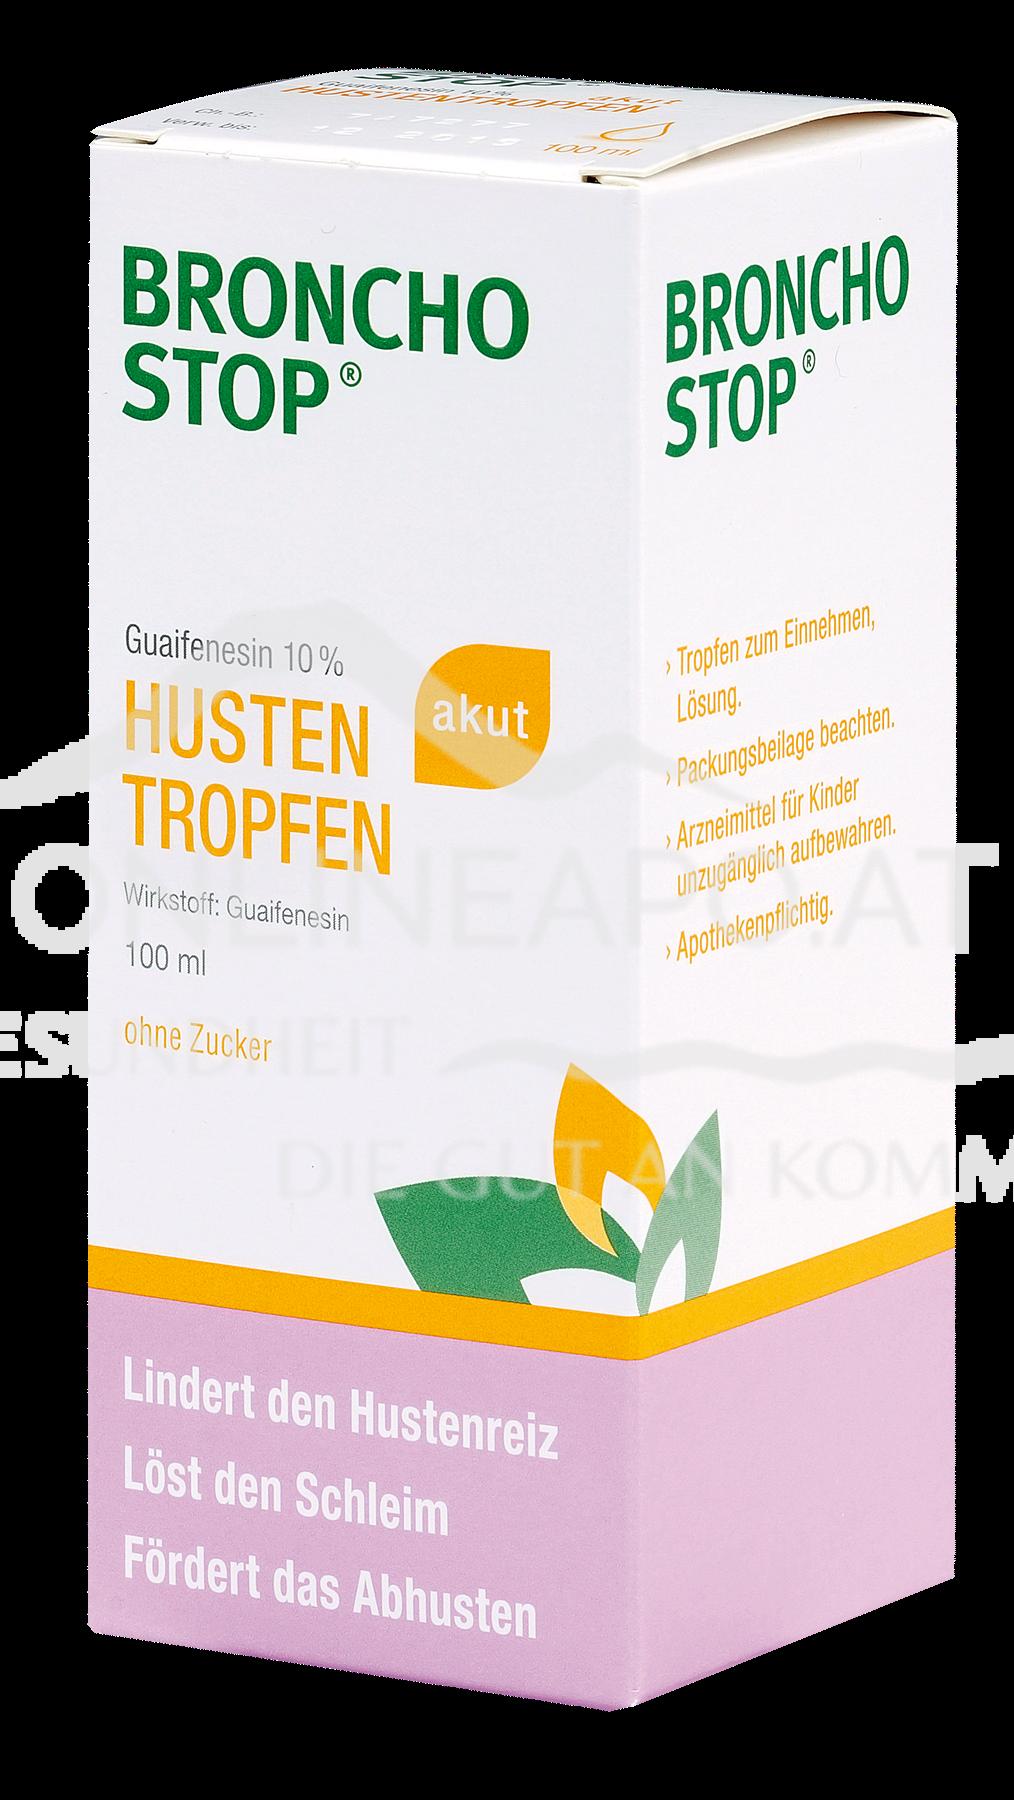 BRONCHOSTOP® Guaifenesin 10% akut Hustentropfen